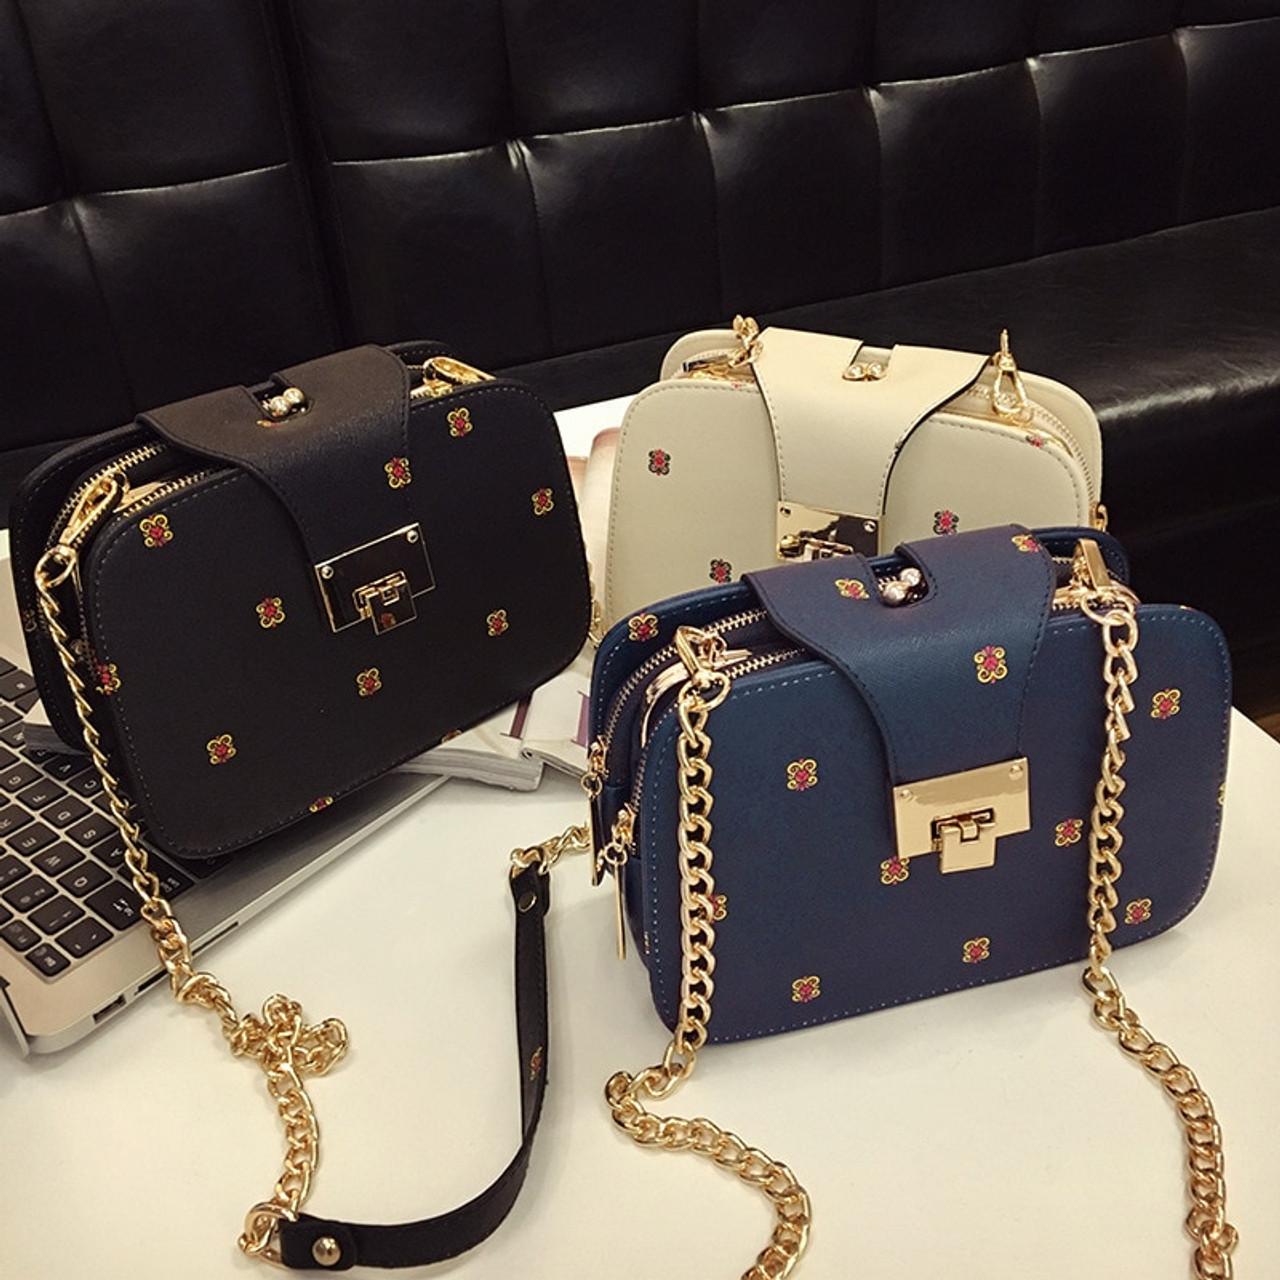 709c6f5ff150 Fashion Chain Leather Women Shoulder Bags Solid Lock Messenger Crossbody  Bag Small Ladies Handbags Bolsa Feminine Sac A Main X36 - OnshopDeals.Com